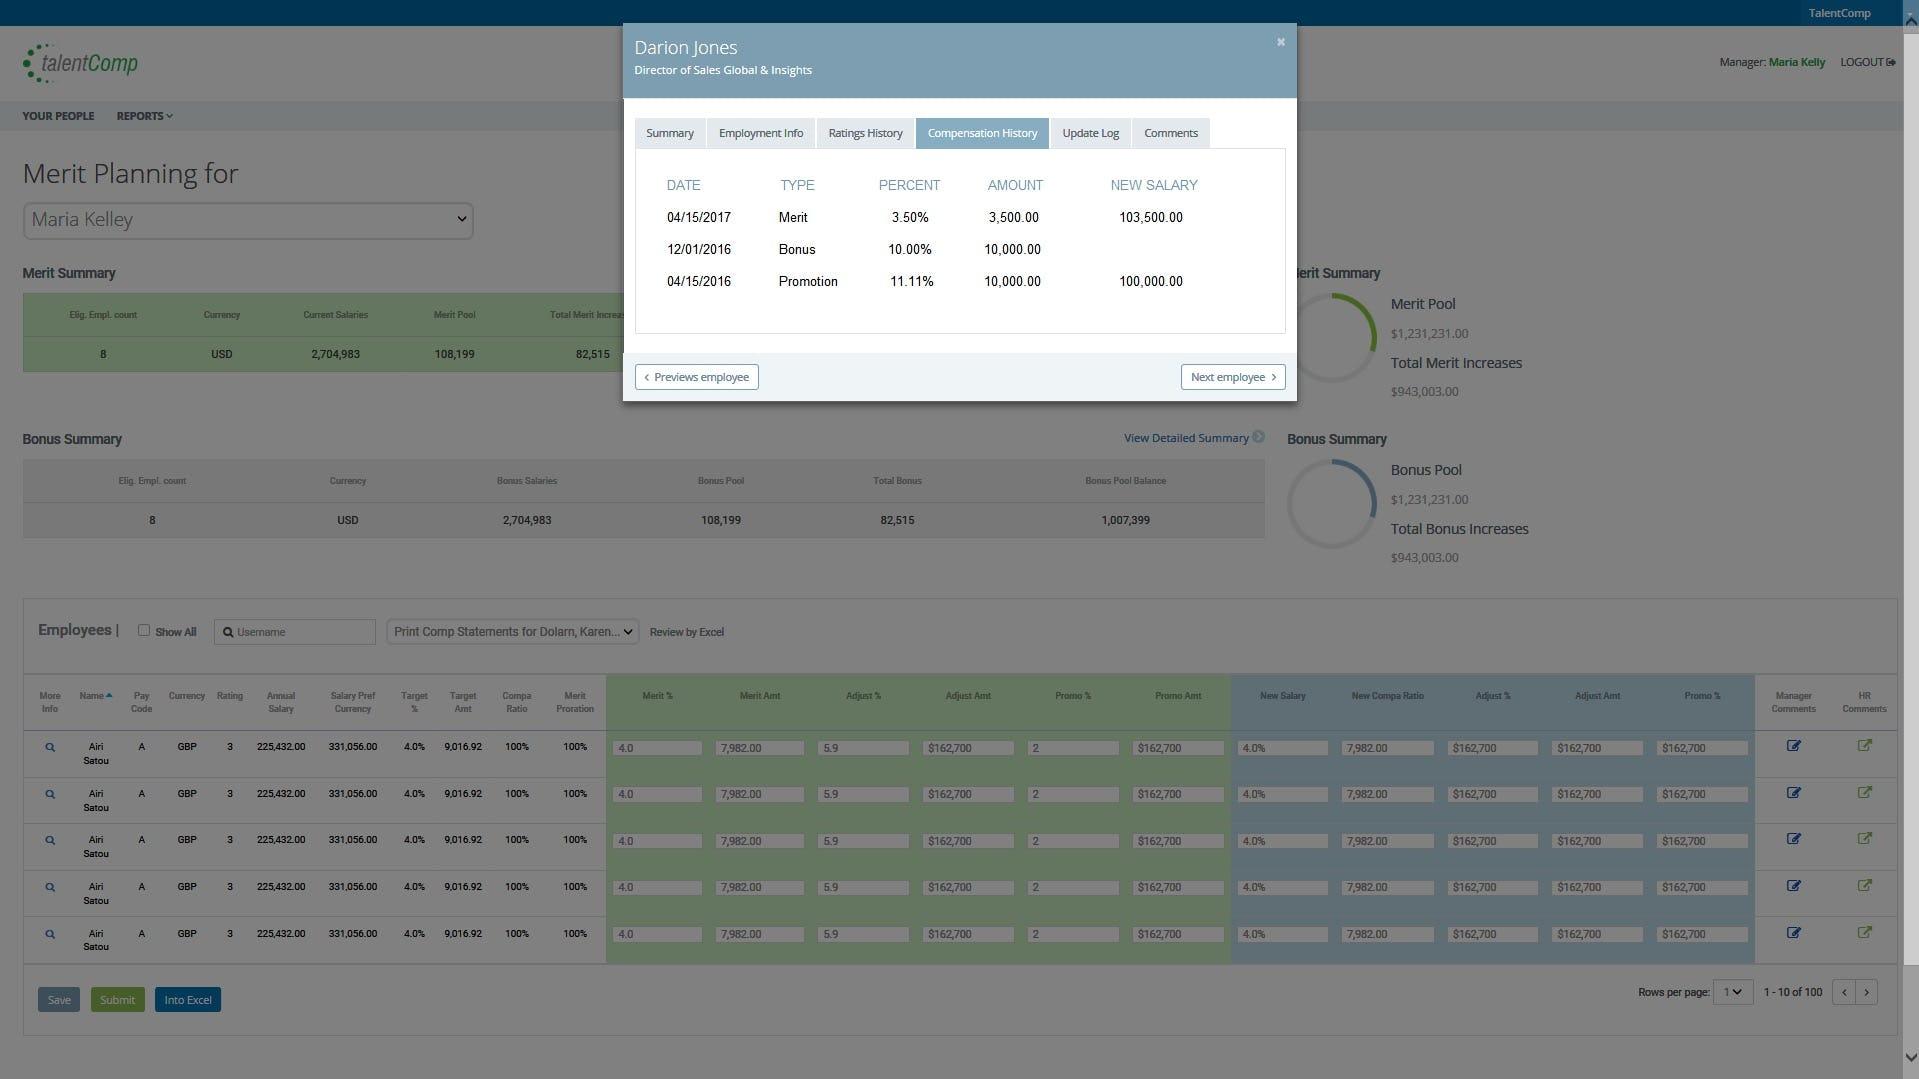 TalentComp Software - Compensation history